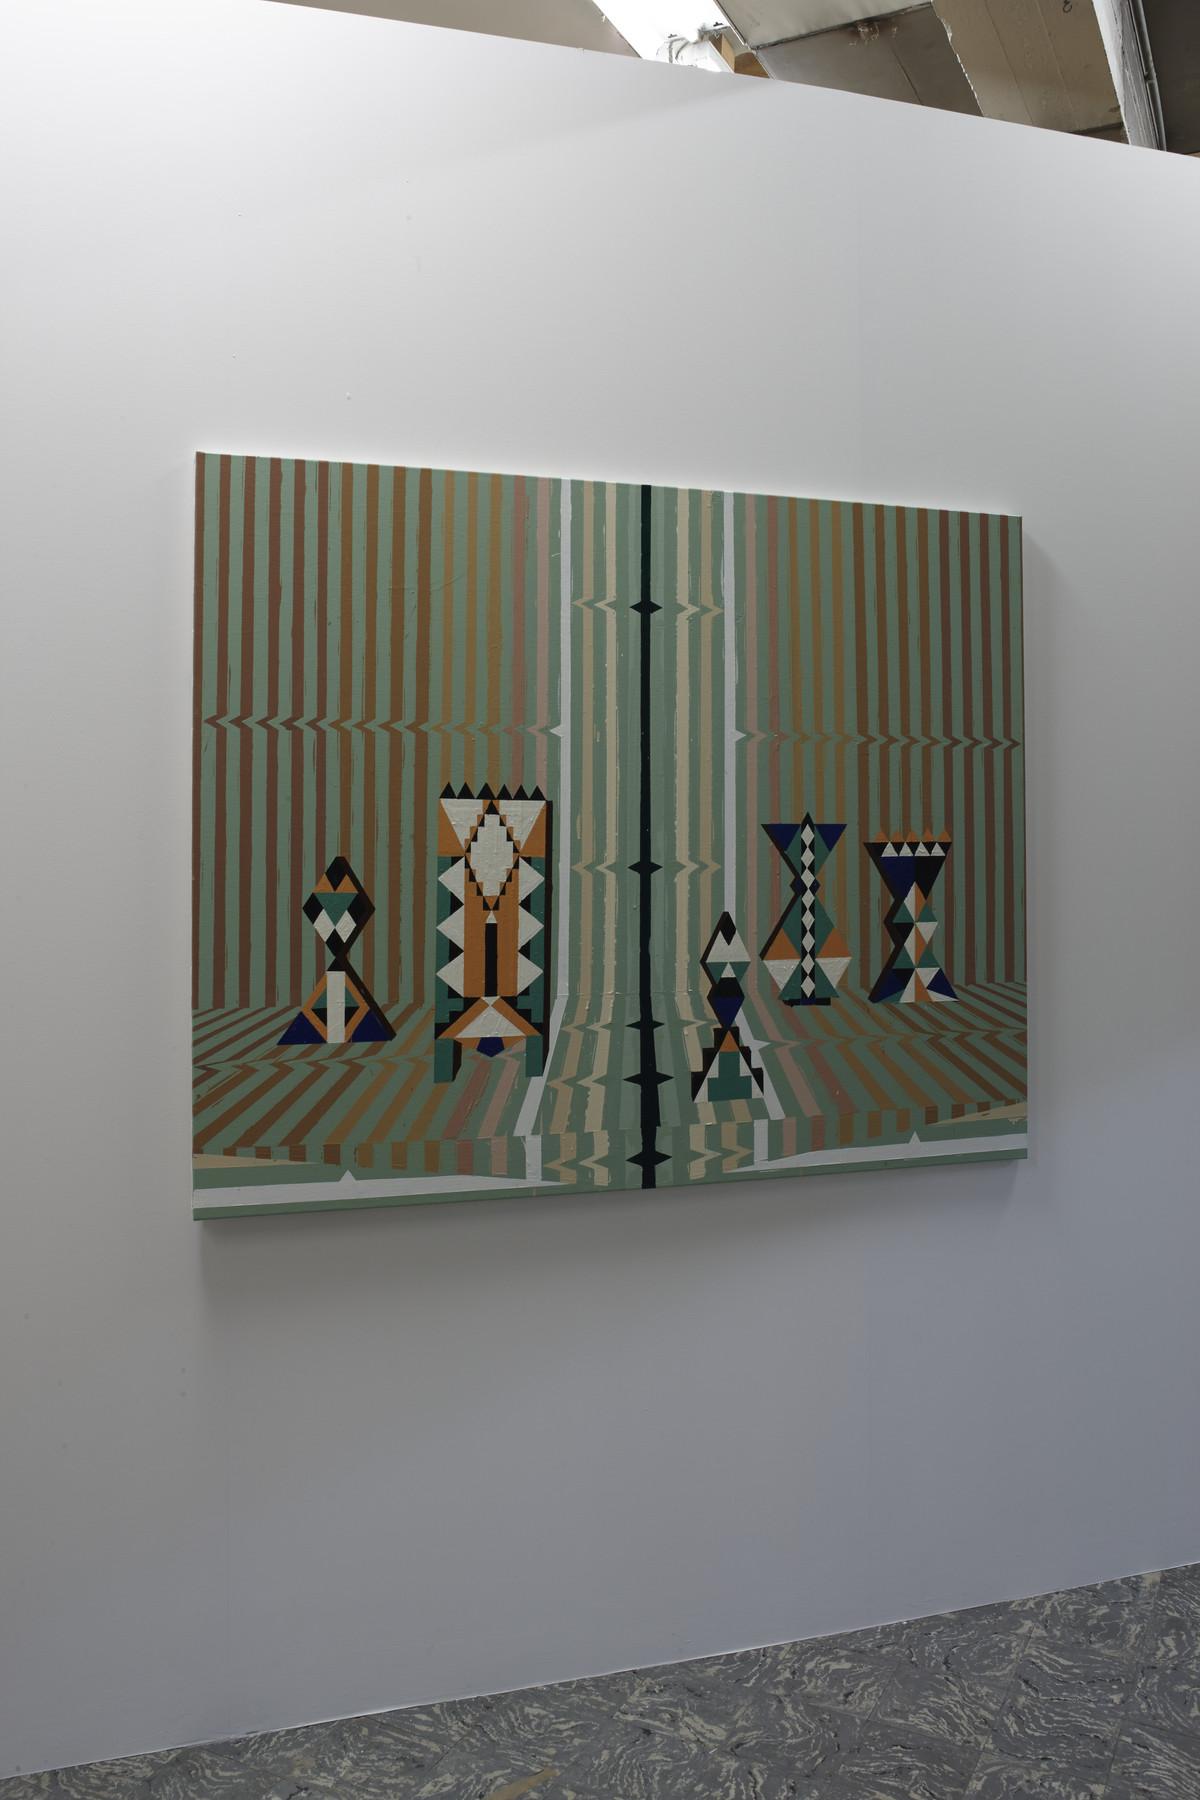 Farah Atassi, 'Hypnotic Setting', 2015, in 'Farah Atassi', installation view, Extra City Kunsthal, 2015 © Jan Kempenaers